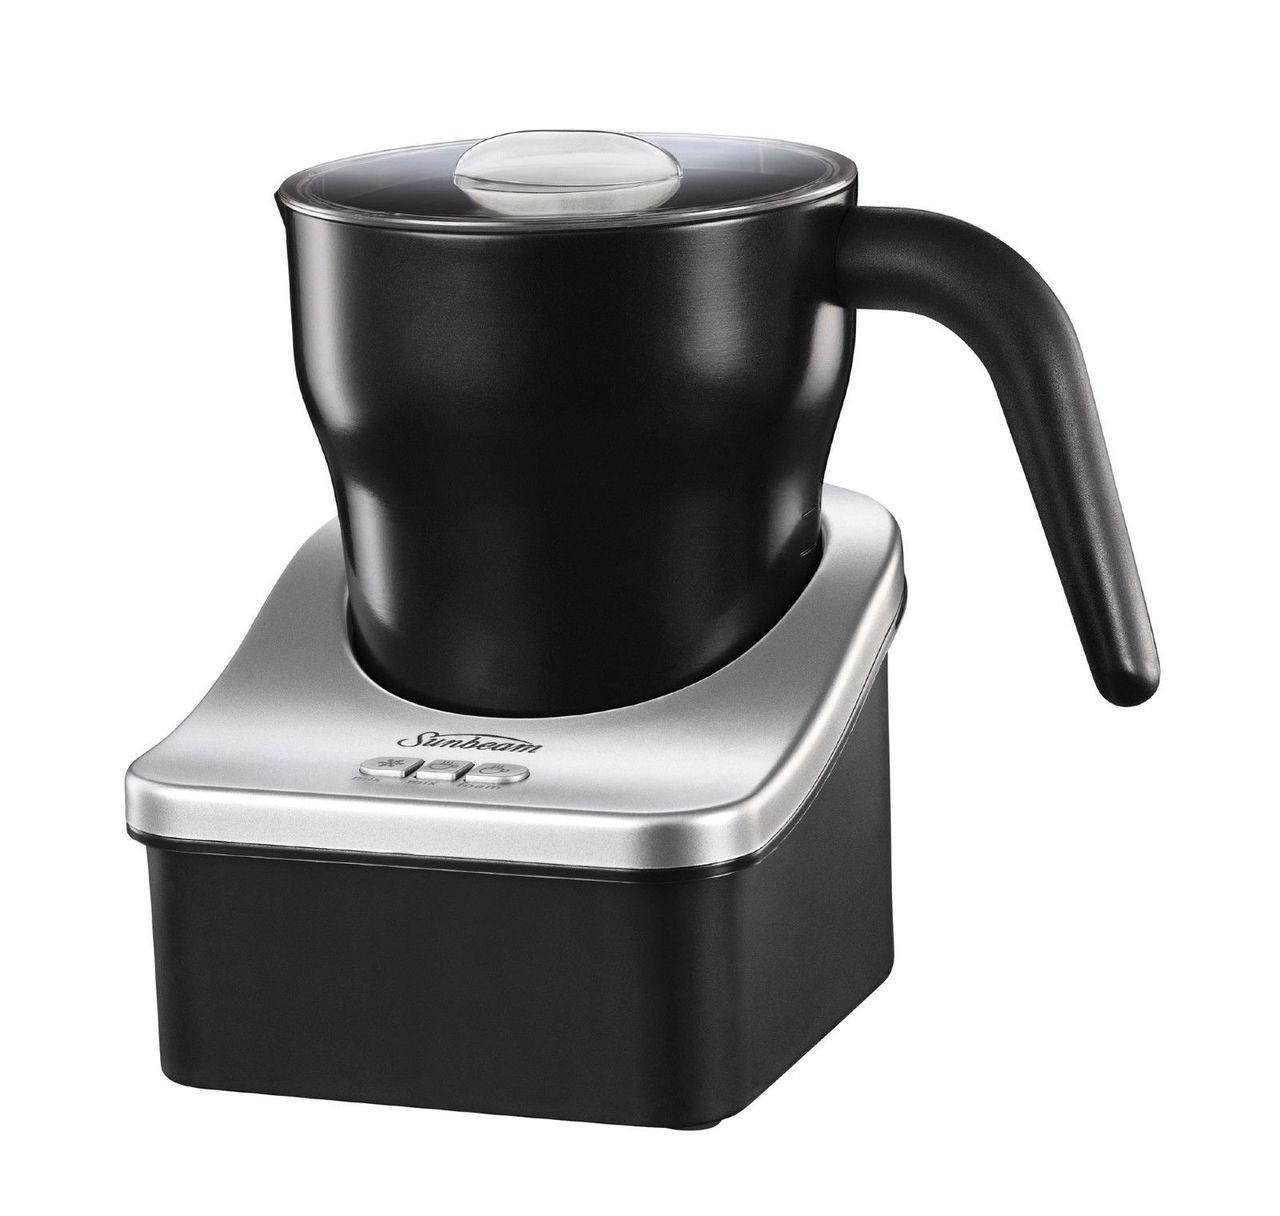 Sunbeam EM0180 Cafe Creamy™ Automatic Milk Frother